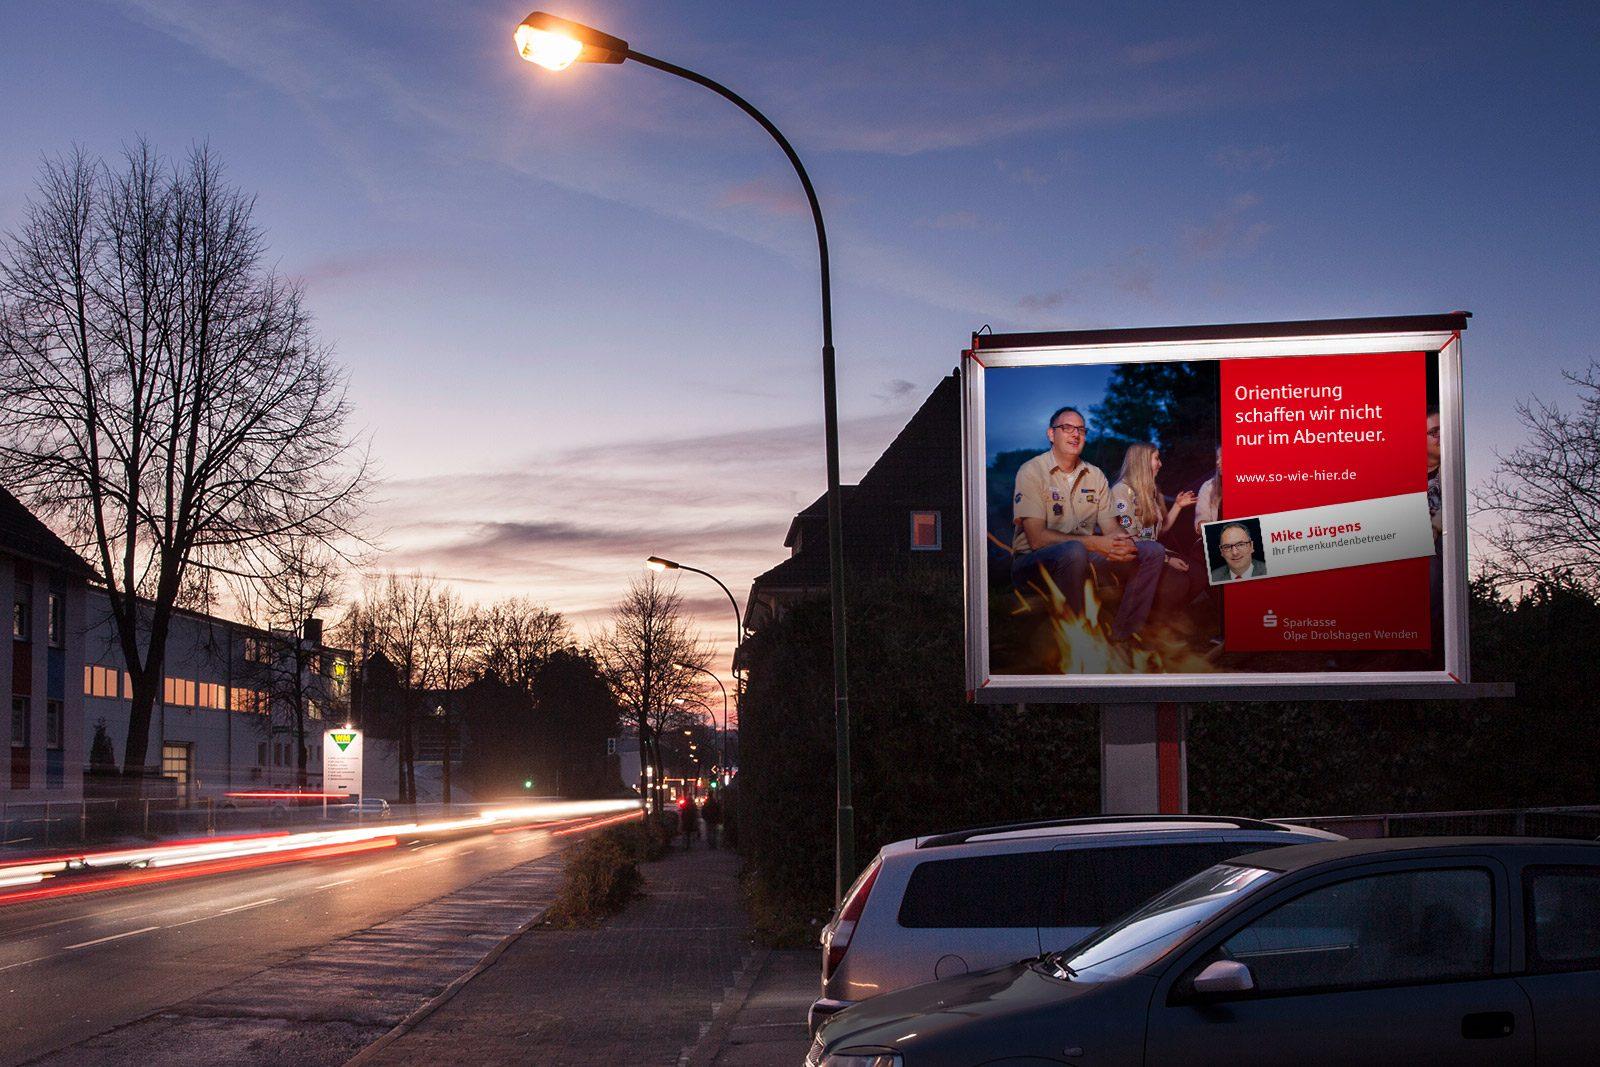 kampagne-sparkasse-olpe-drolshagen-wenden-181-05